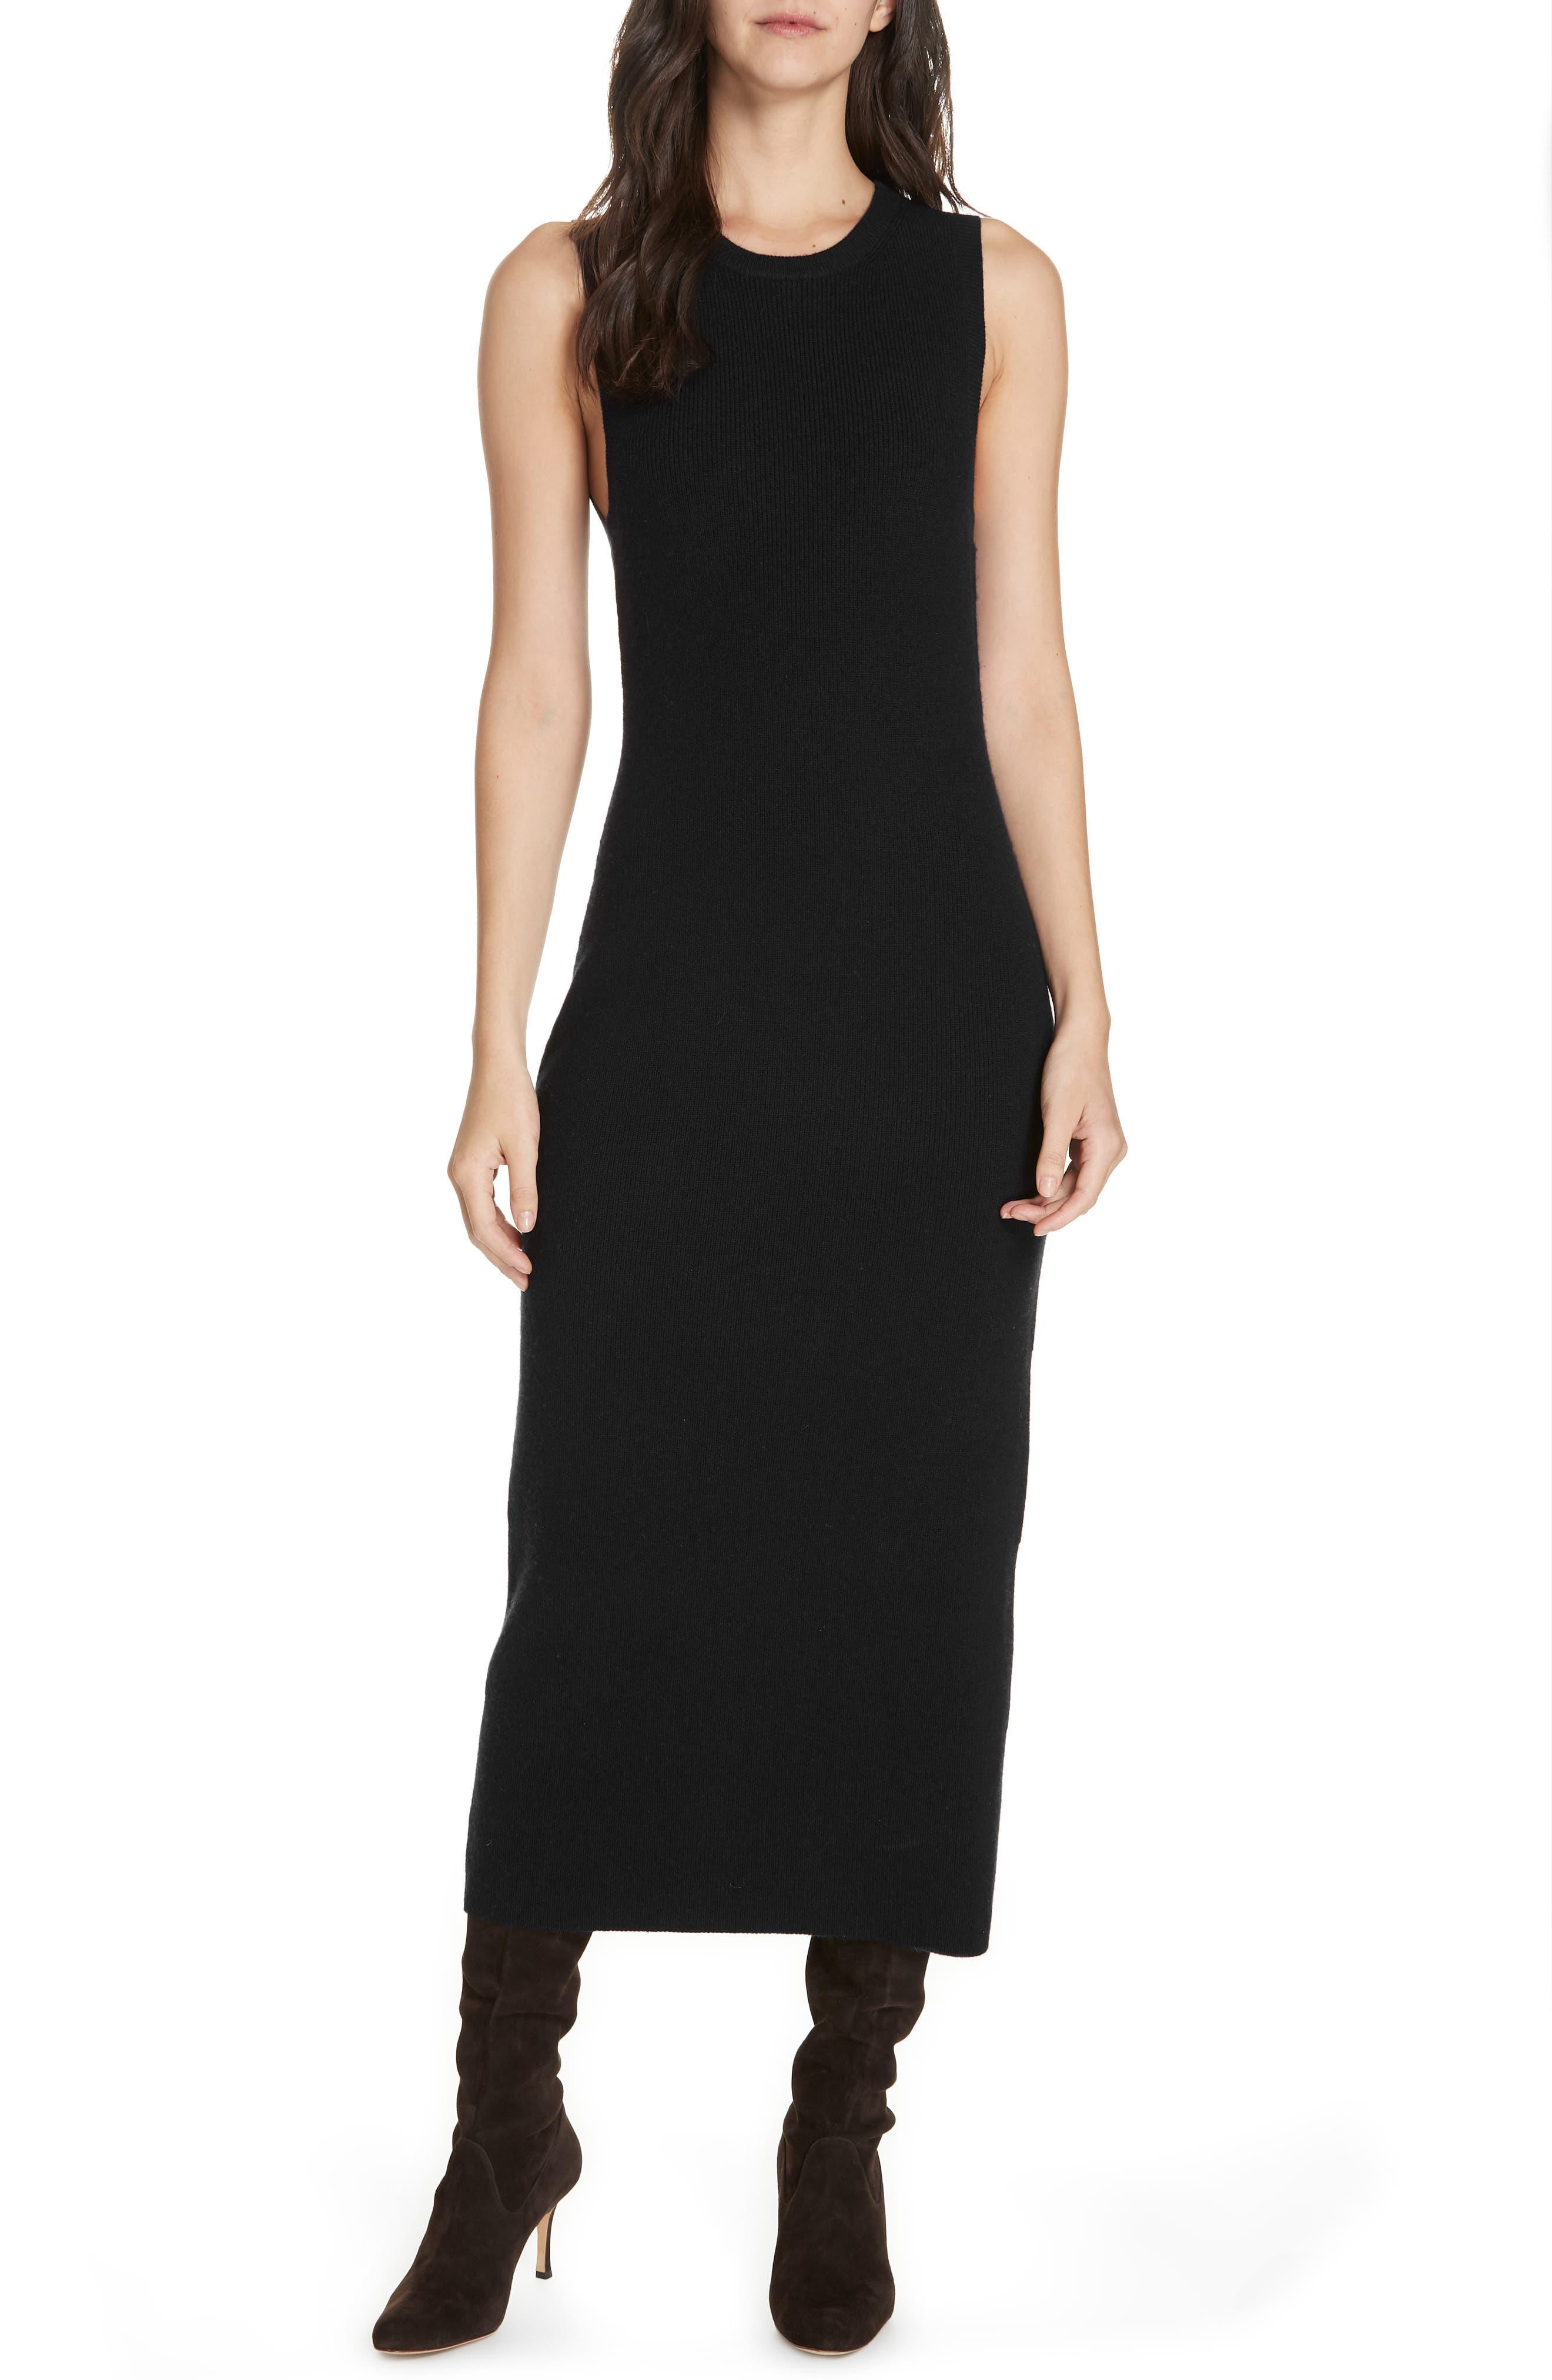 JENNI KAYNE Midi Sweater Dress in Black